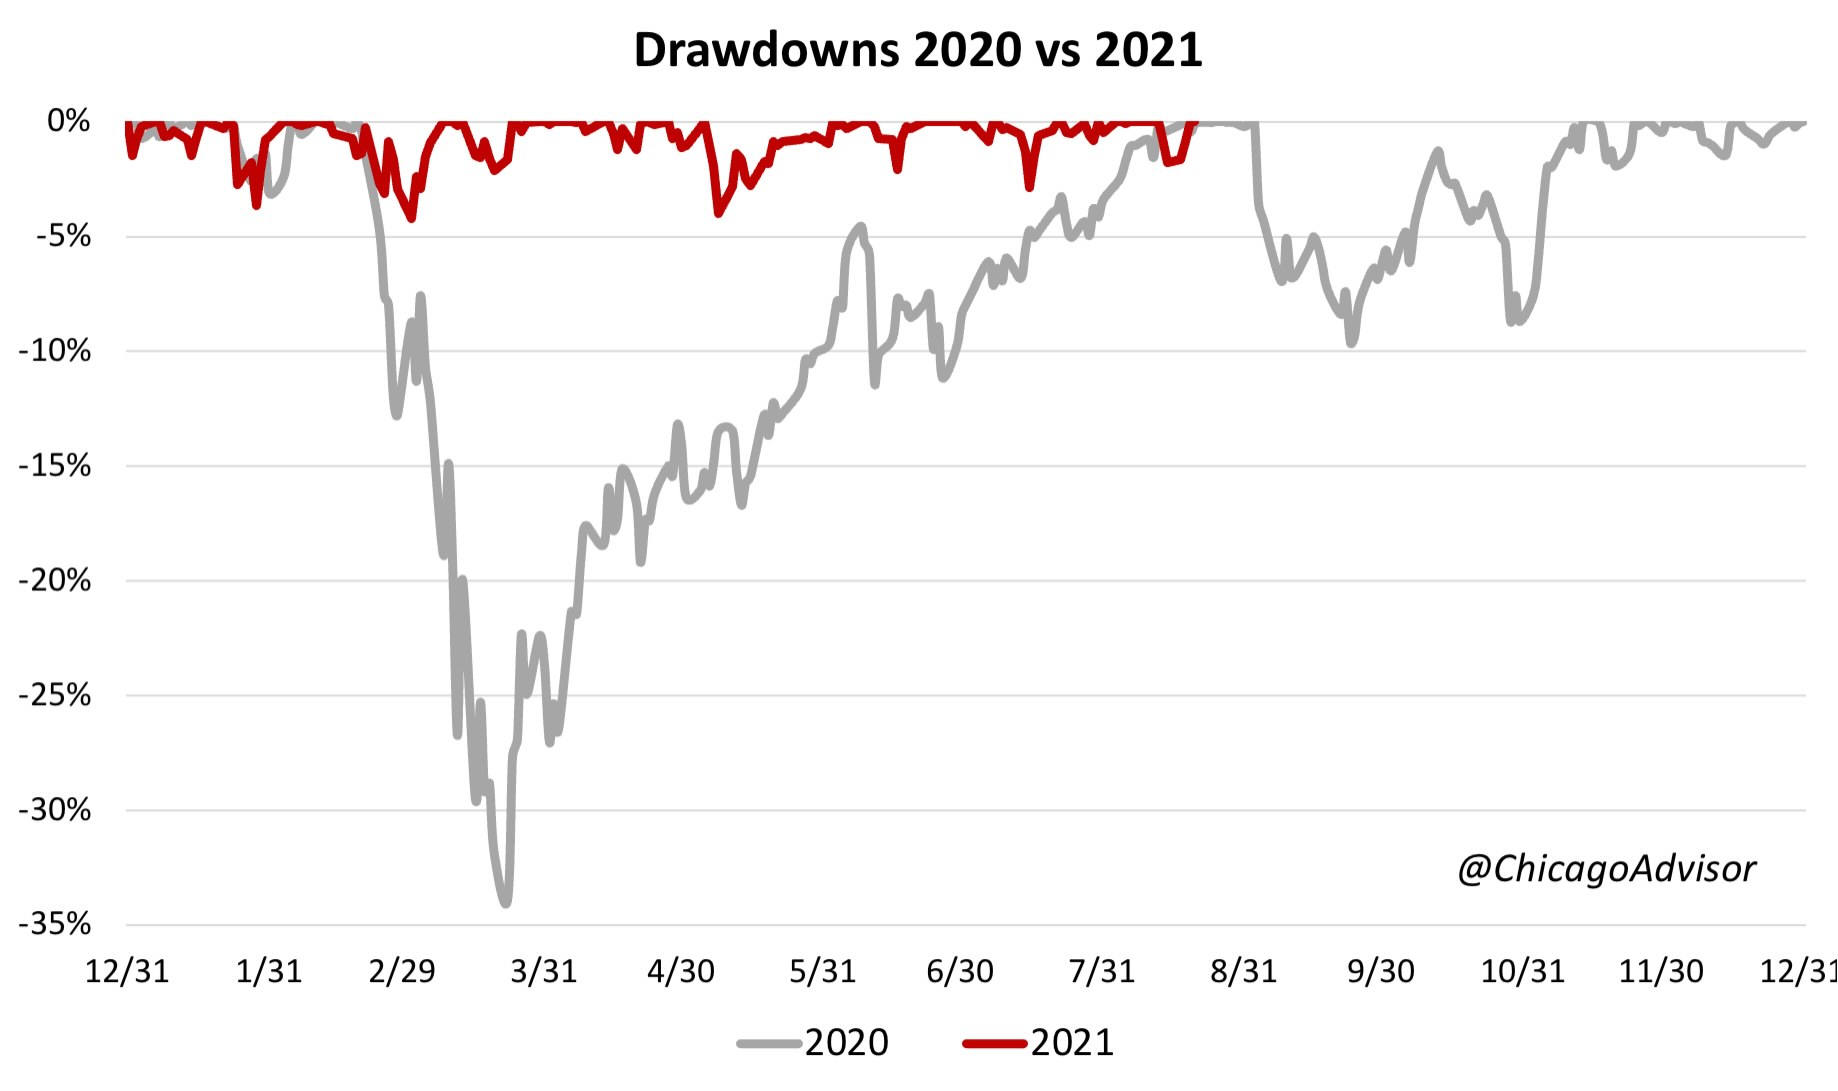 Drawdowns 2020 vs 2021